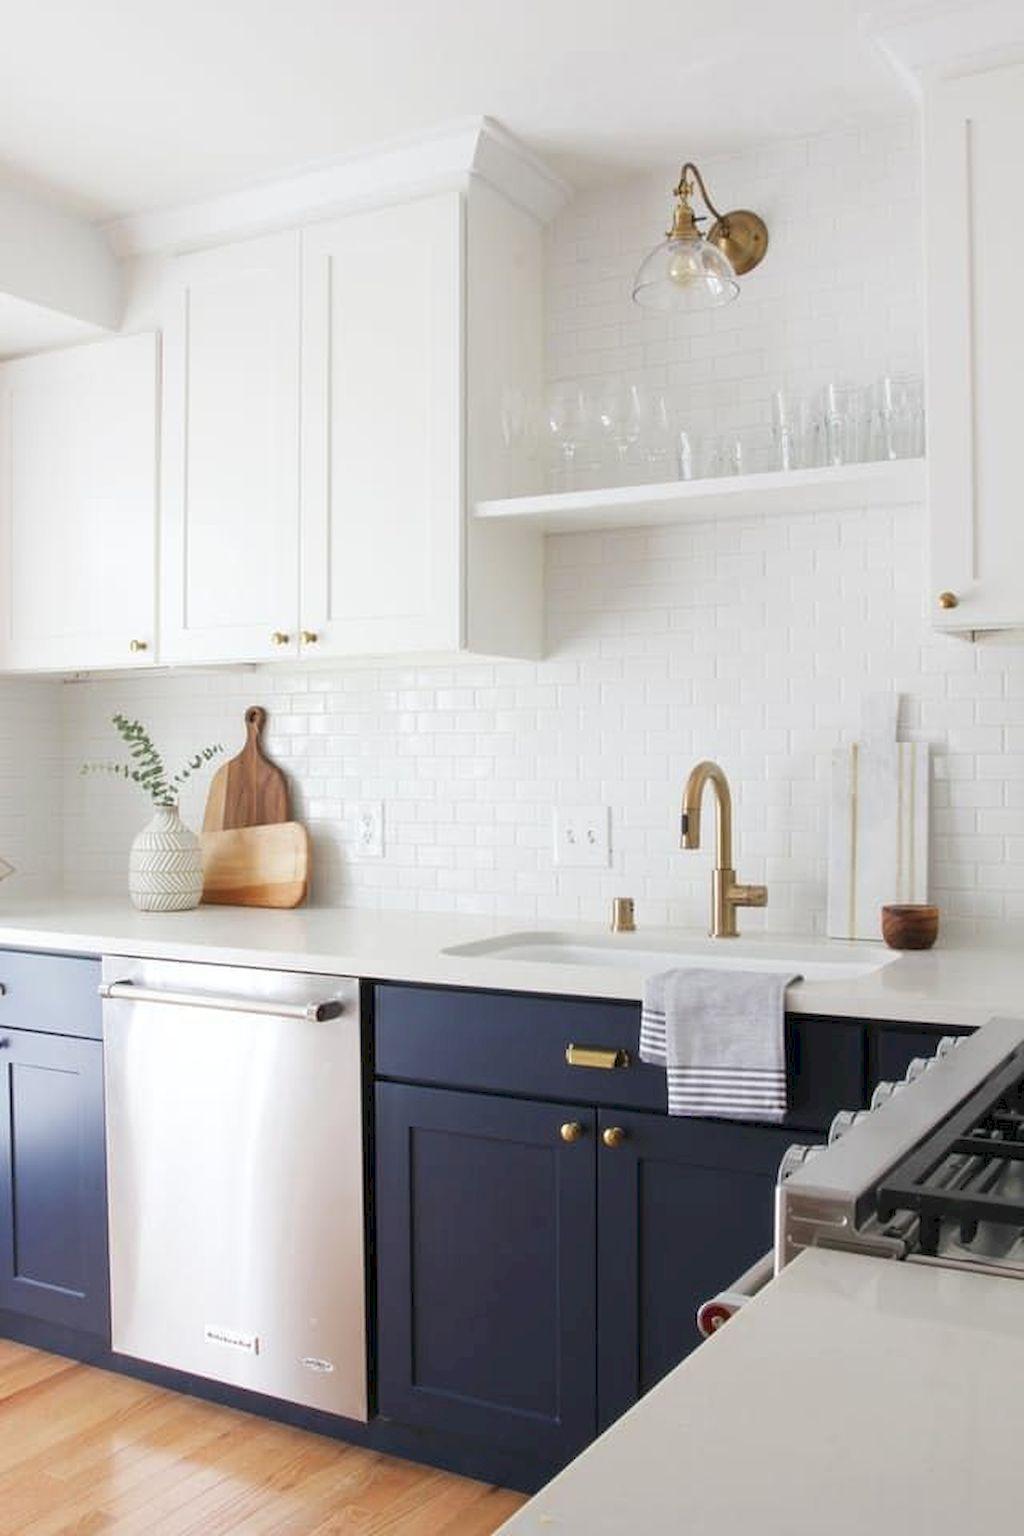 Gorgeous awesome apartment kitchen decorating ideas